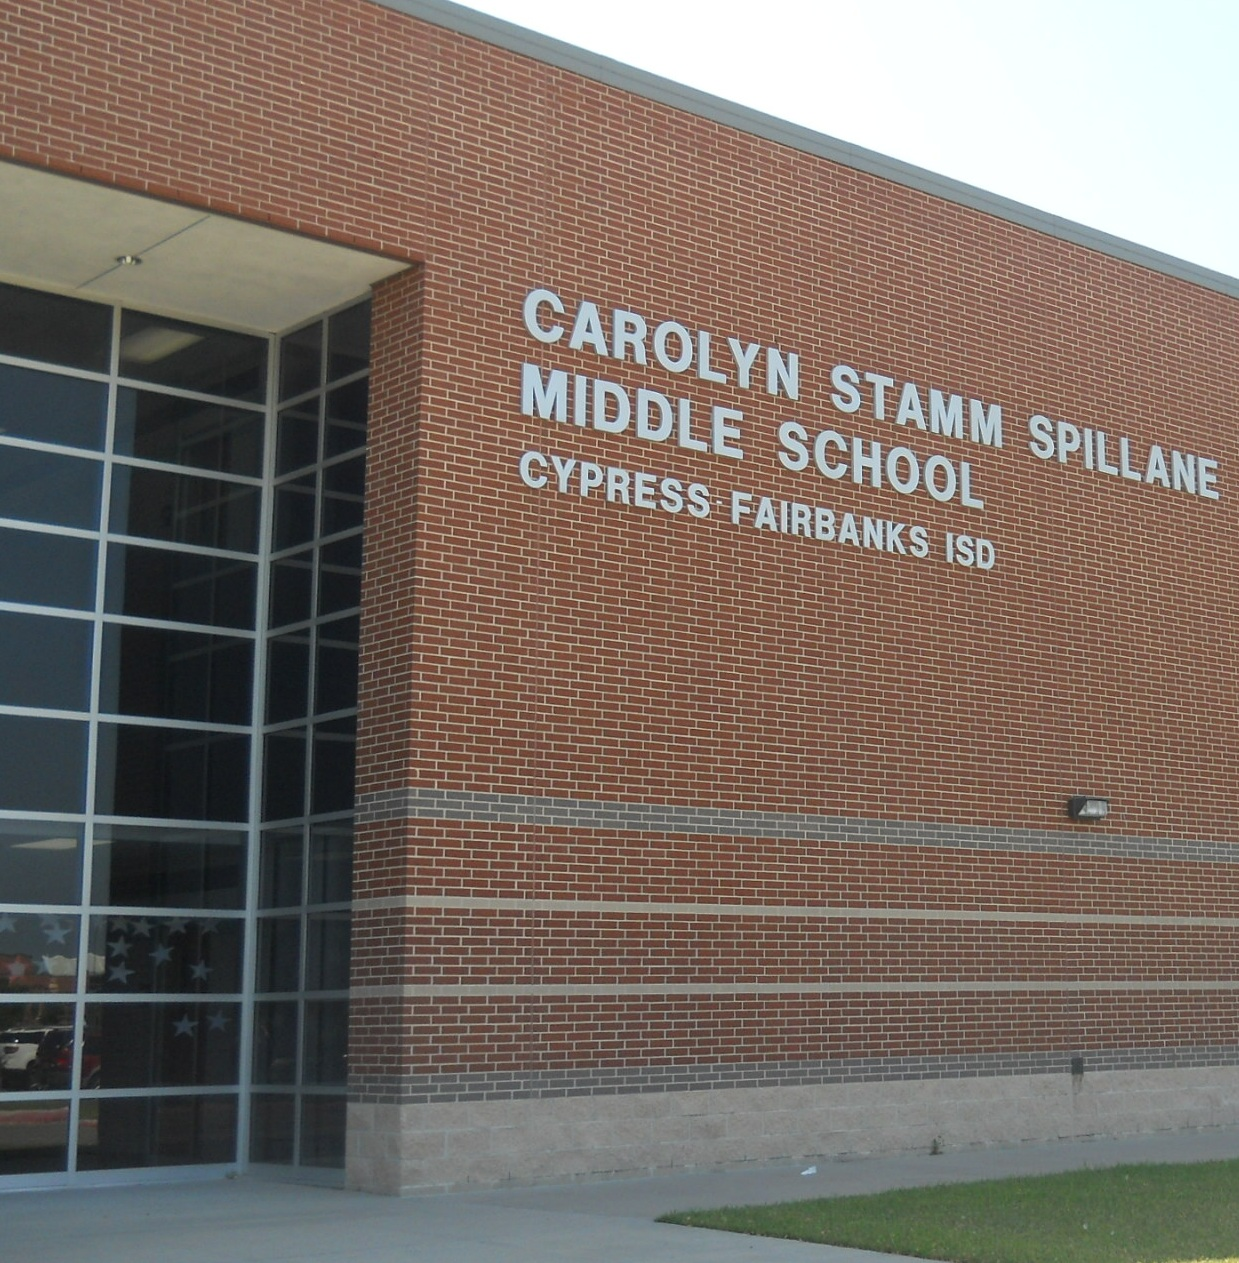 Spillane Middle School